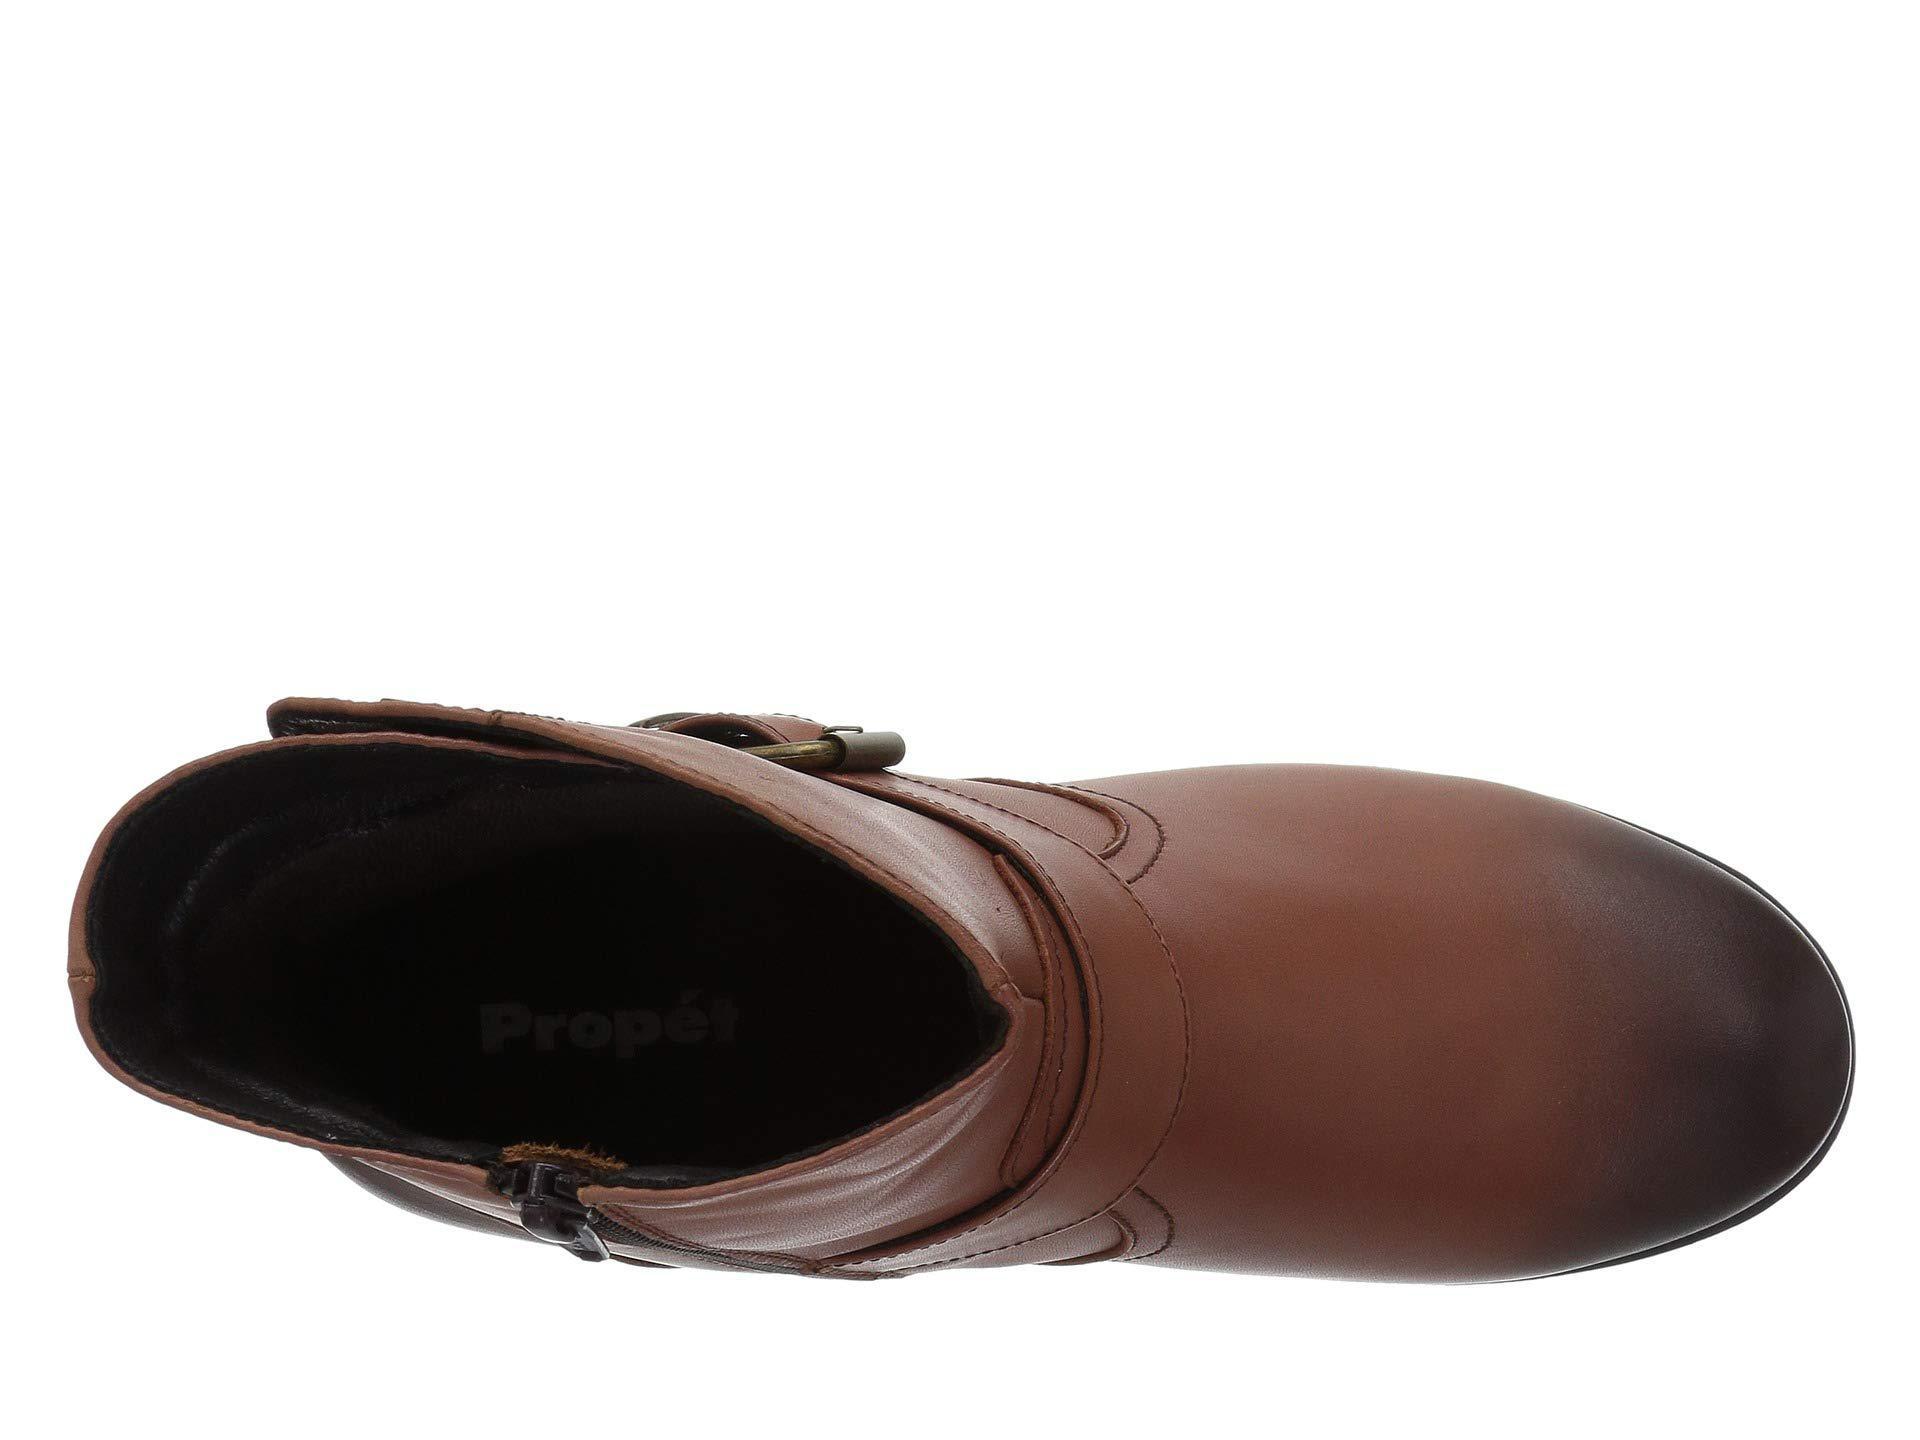 3f1c133b2db8 Lyst - Propet Tory (black) Women s Shoes in Brown